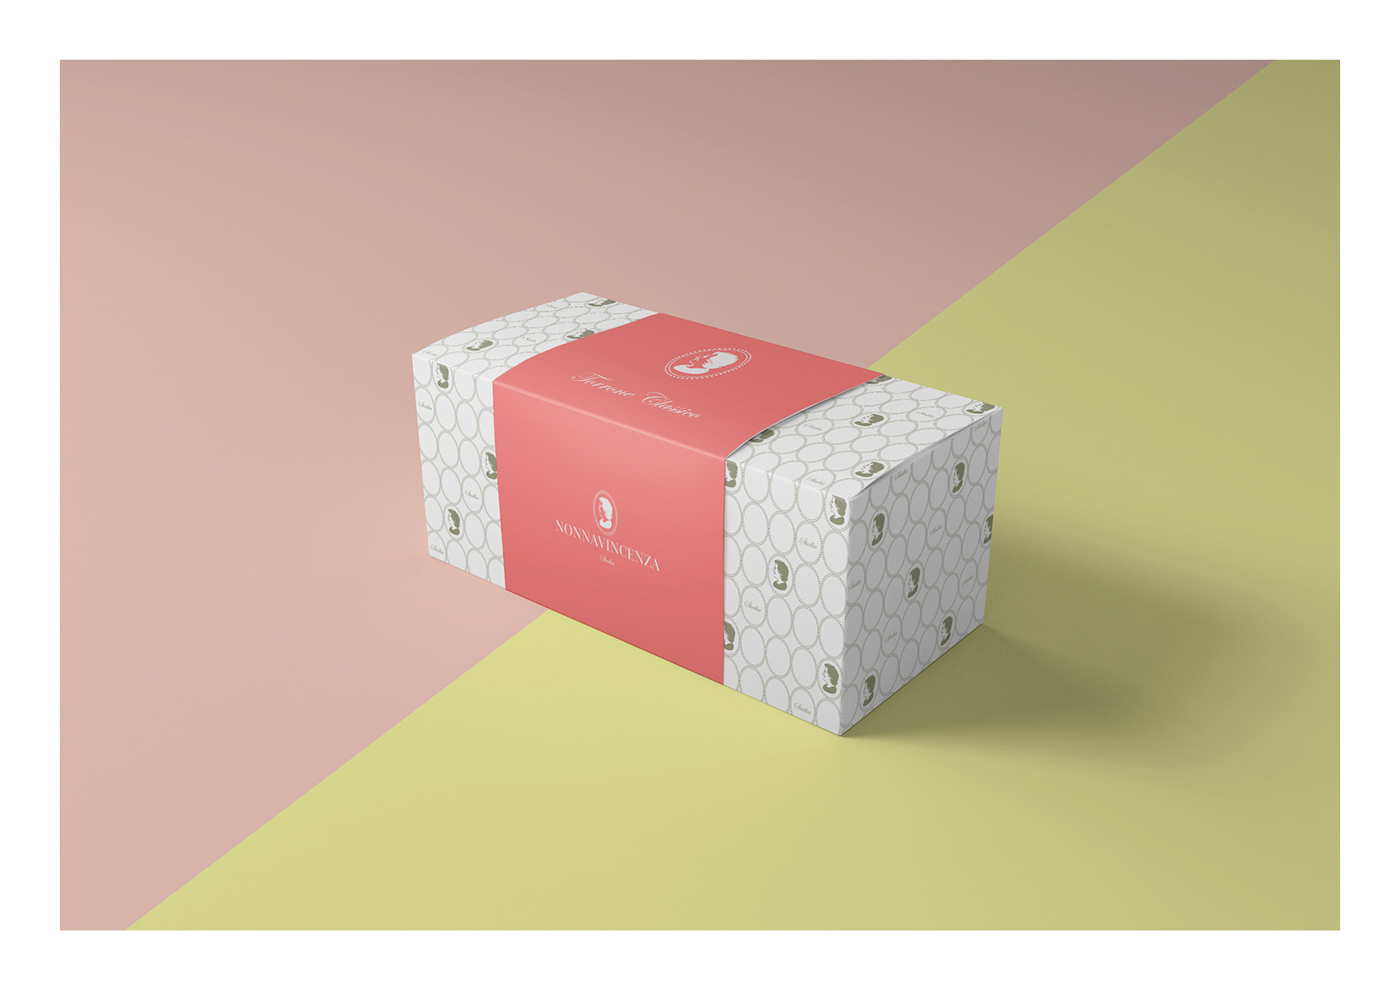 #brandidentity #logotype  #artdirection #packaging #pattern #immaginecoordinata #Branding #Logo #pack #confectionery